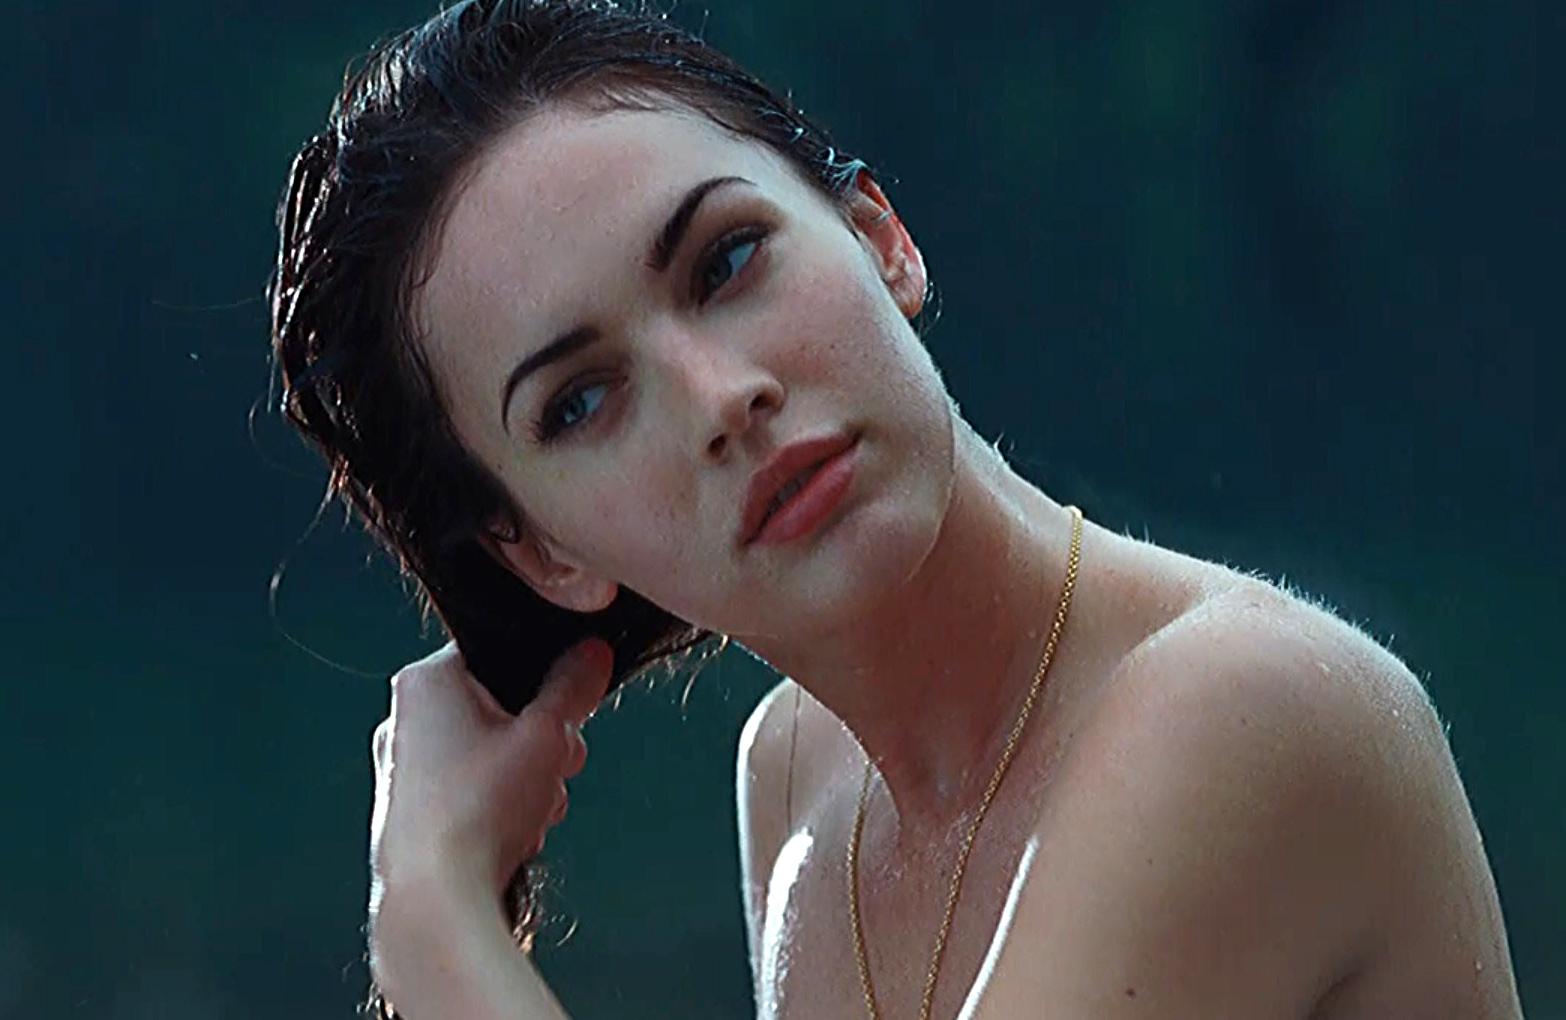 Film Celeb Porn megan fox nude scene in jennifers body movie - free video